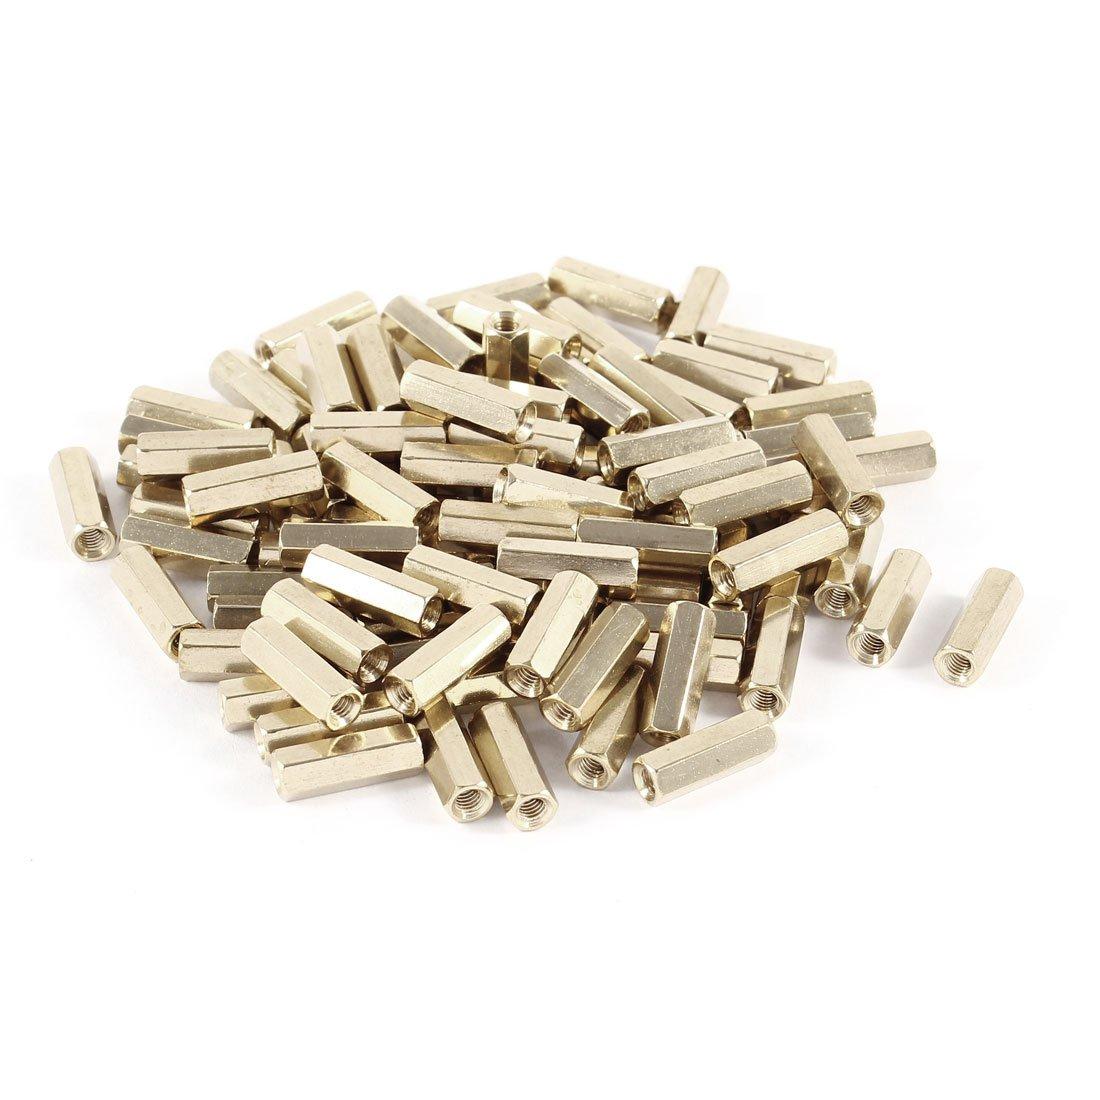 uxcell 50pcs Brass Round Straight PCB Pillar Female Thread Standoff Spacer M2x3x29mm